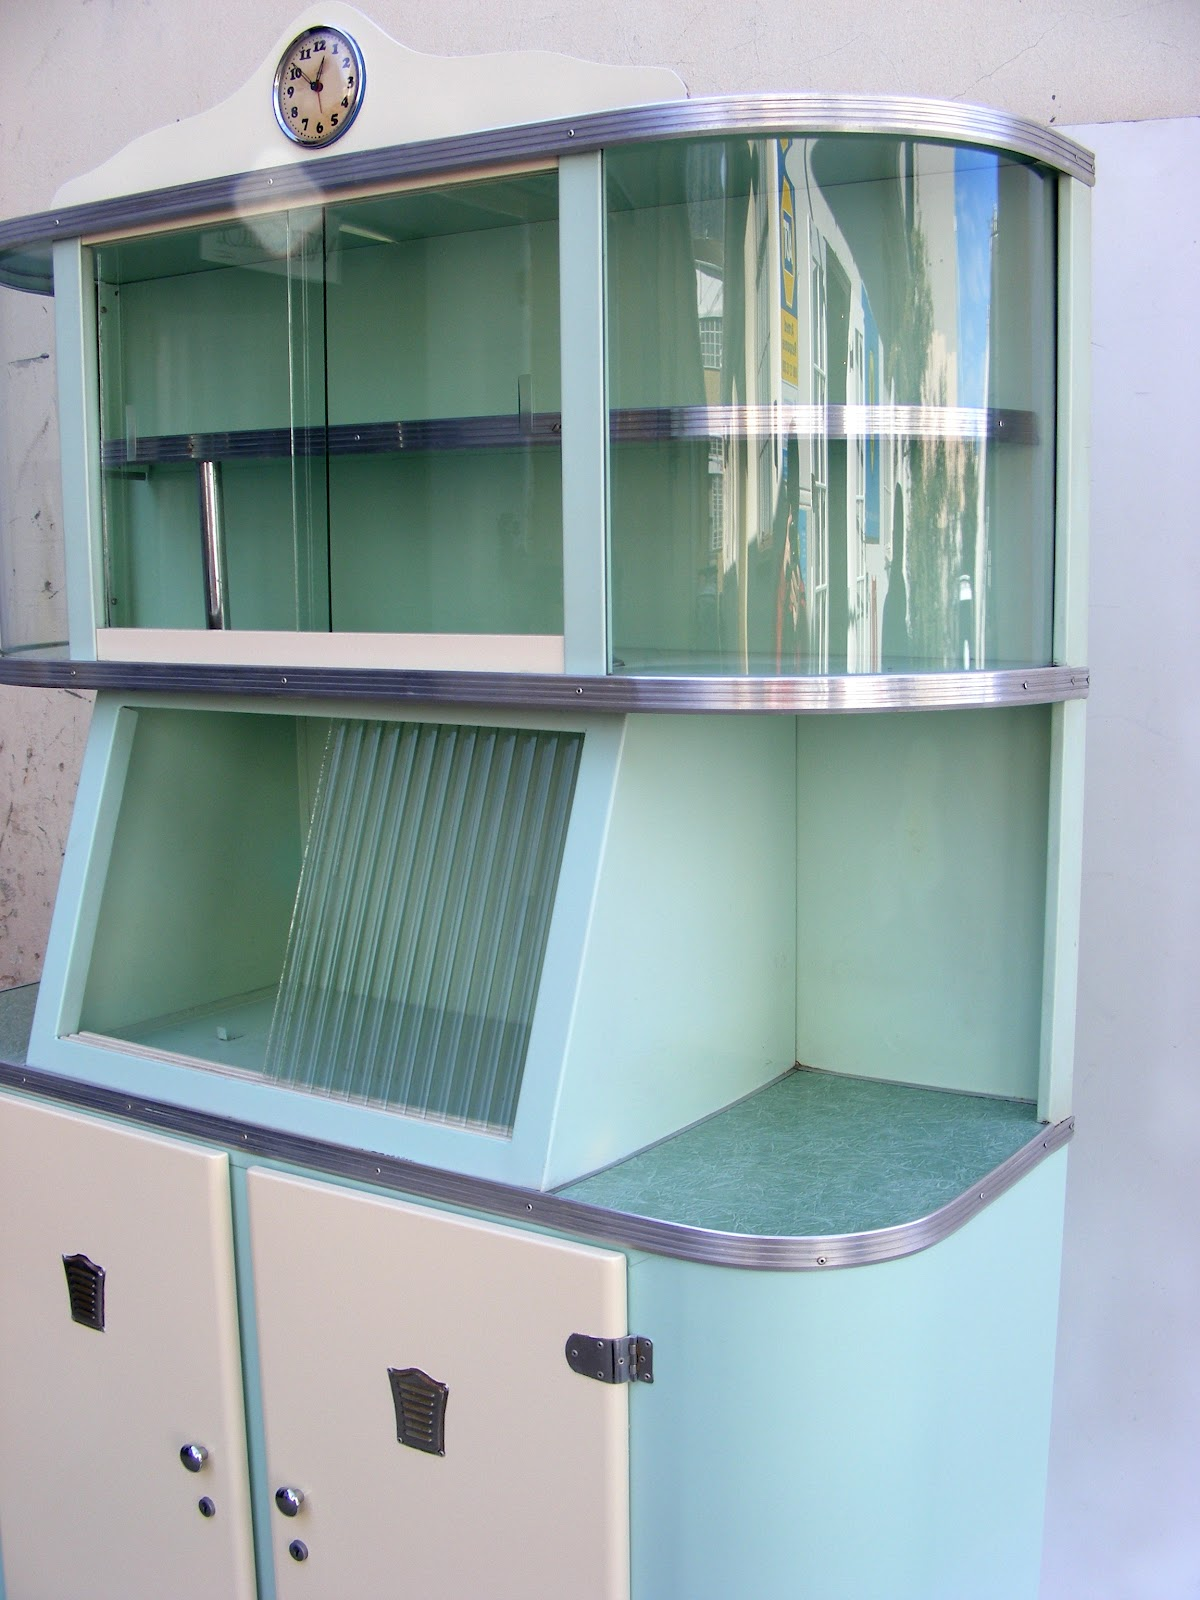 3 Piece Kitchen Units South Africa - compact kitchens ada handicap ...